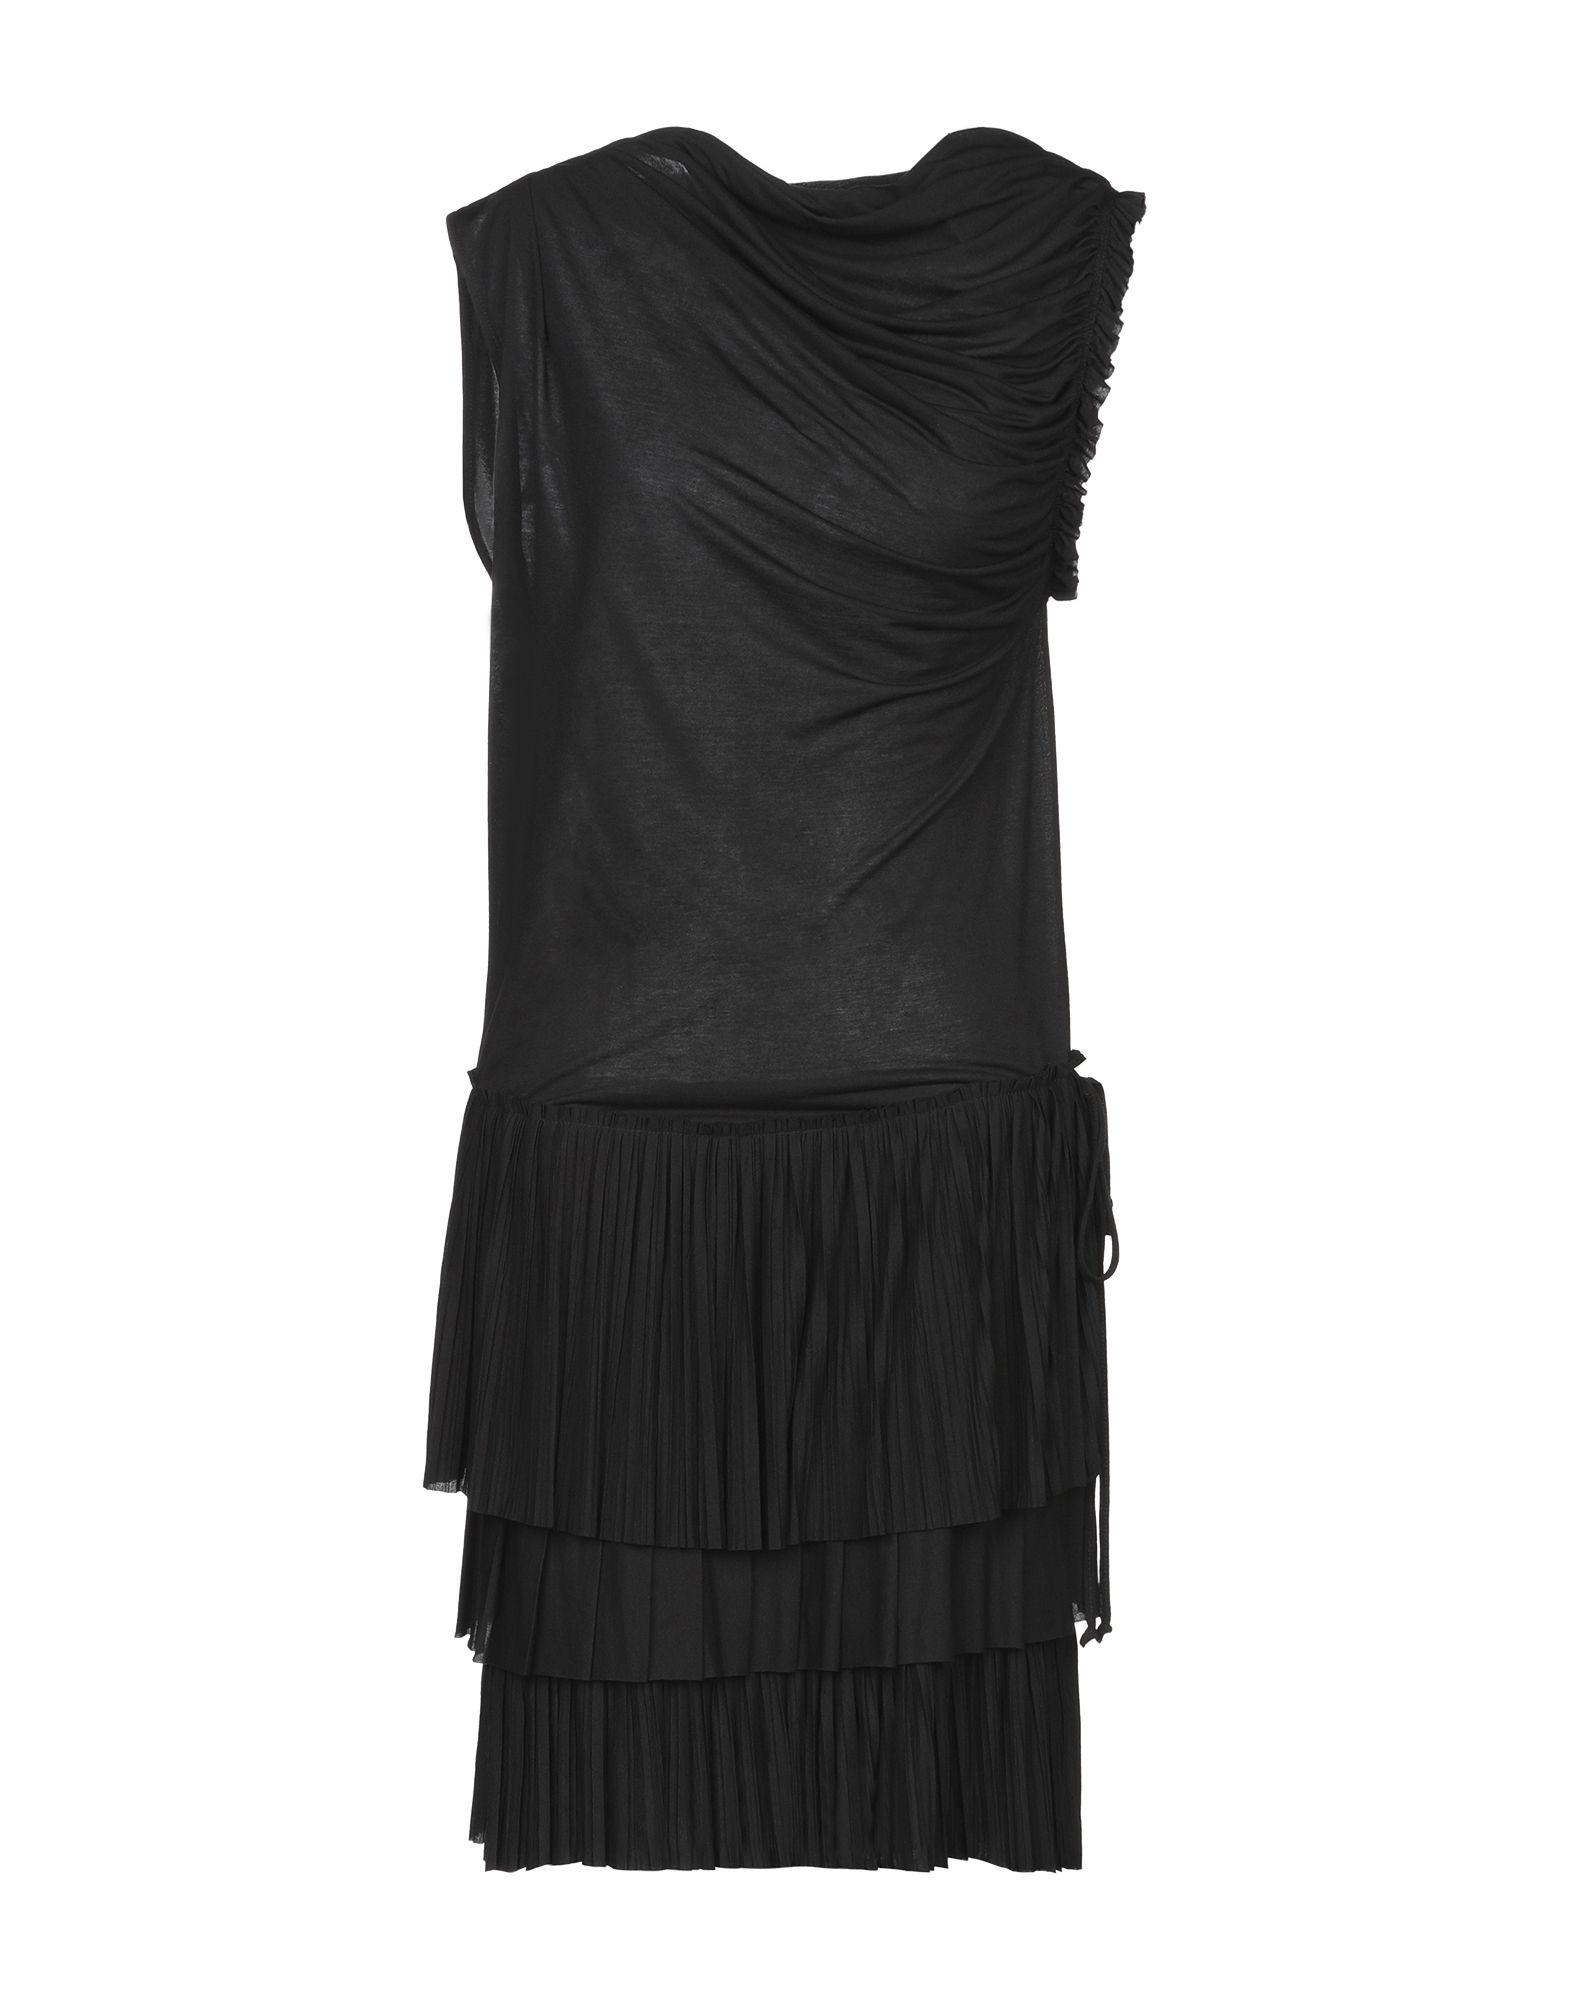 SCERVINO STREET Короткое платье фото